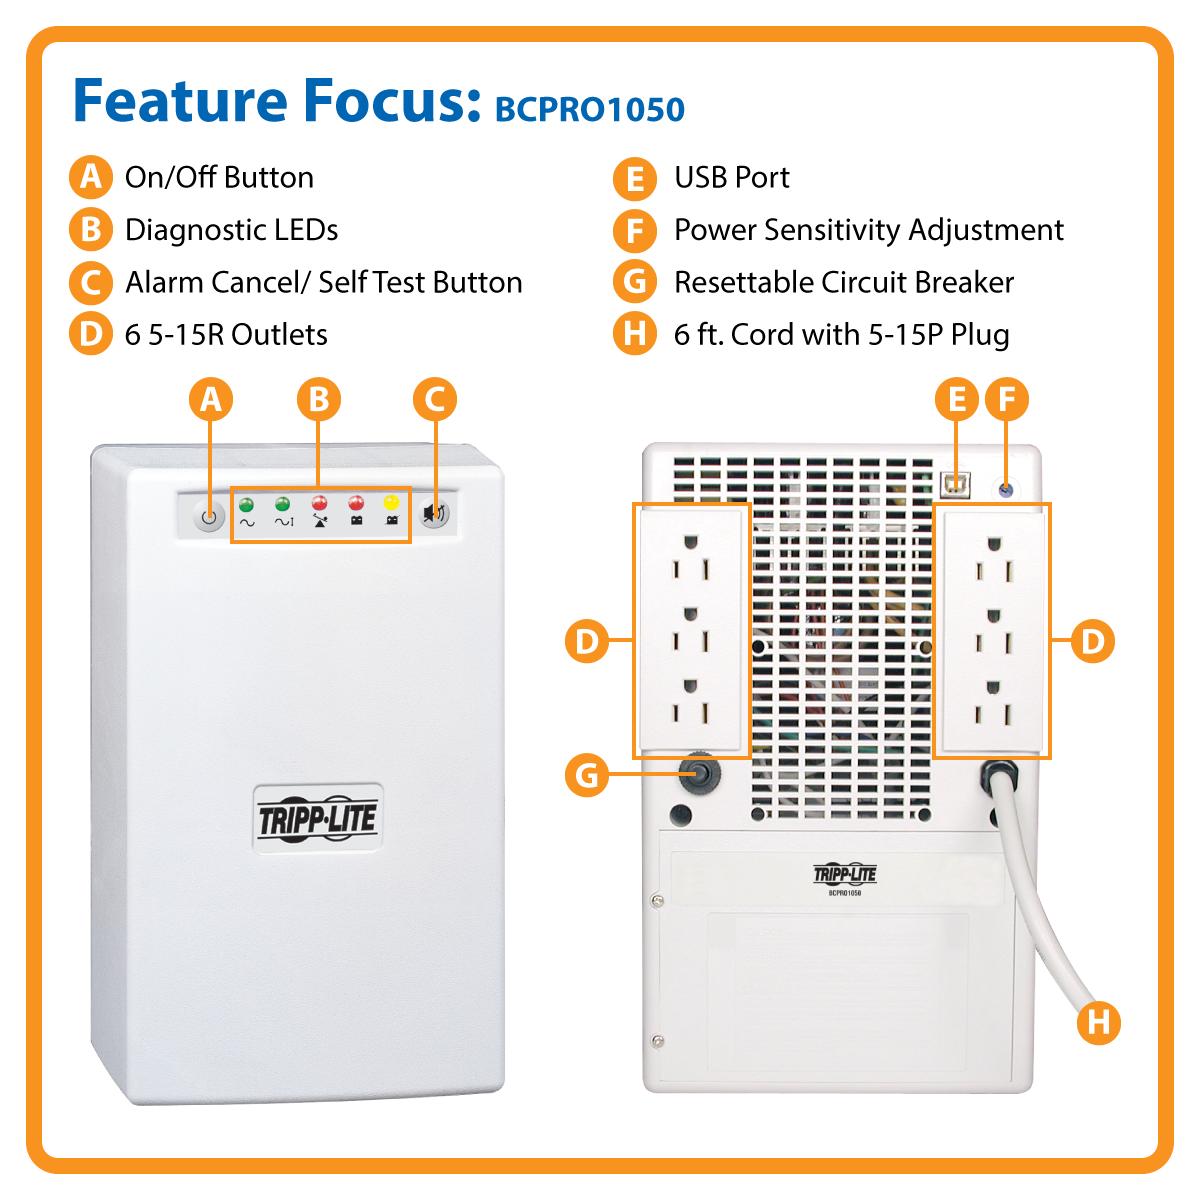 Tripp Lite Bcpro1050 Battery Wiring Diagram Free Download Apc Backup Amazon Com 1050va 705w Ups Desktop